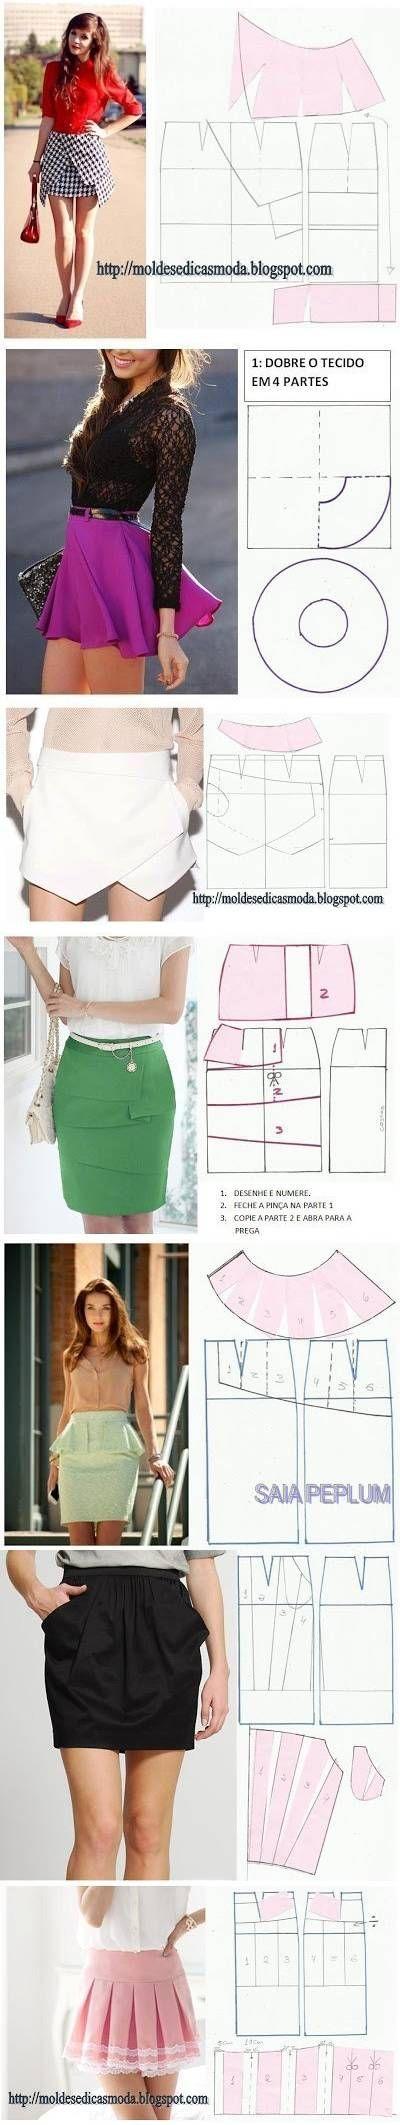 DIY Skirts | DIY | Pinterest | Costura, Patrones and Ropa